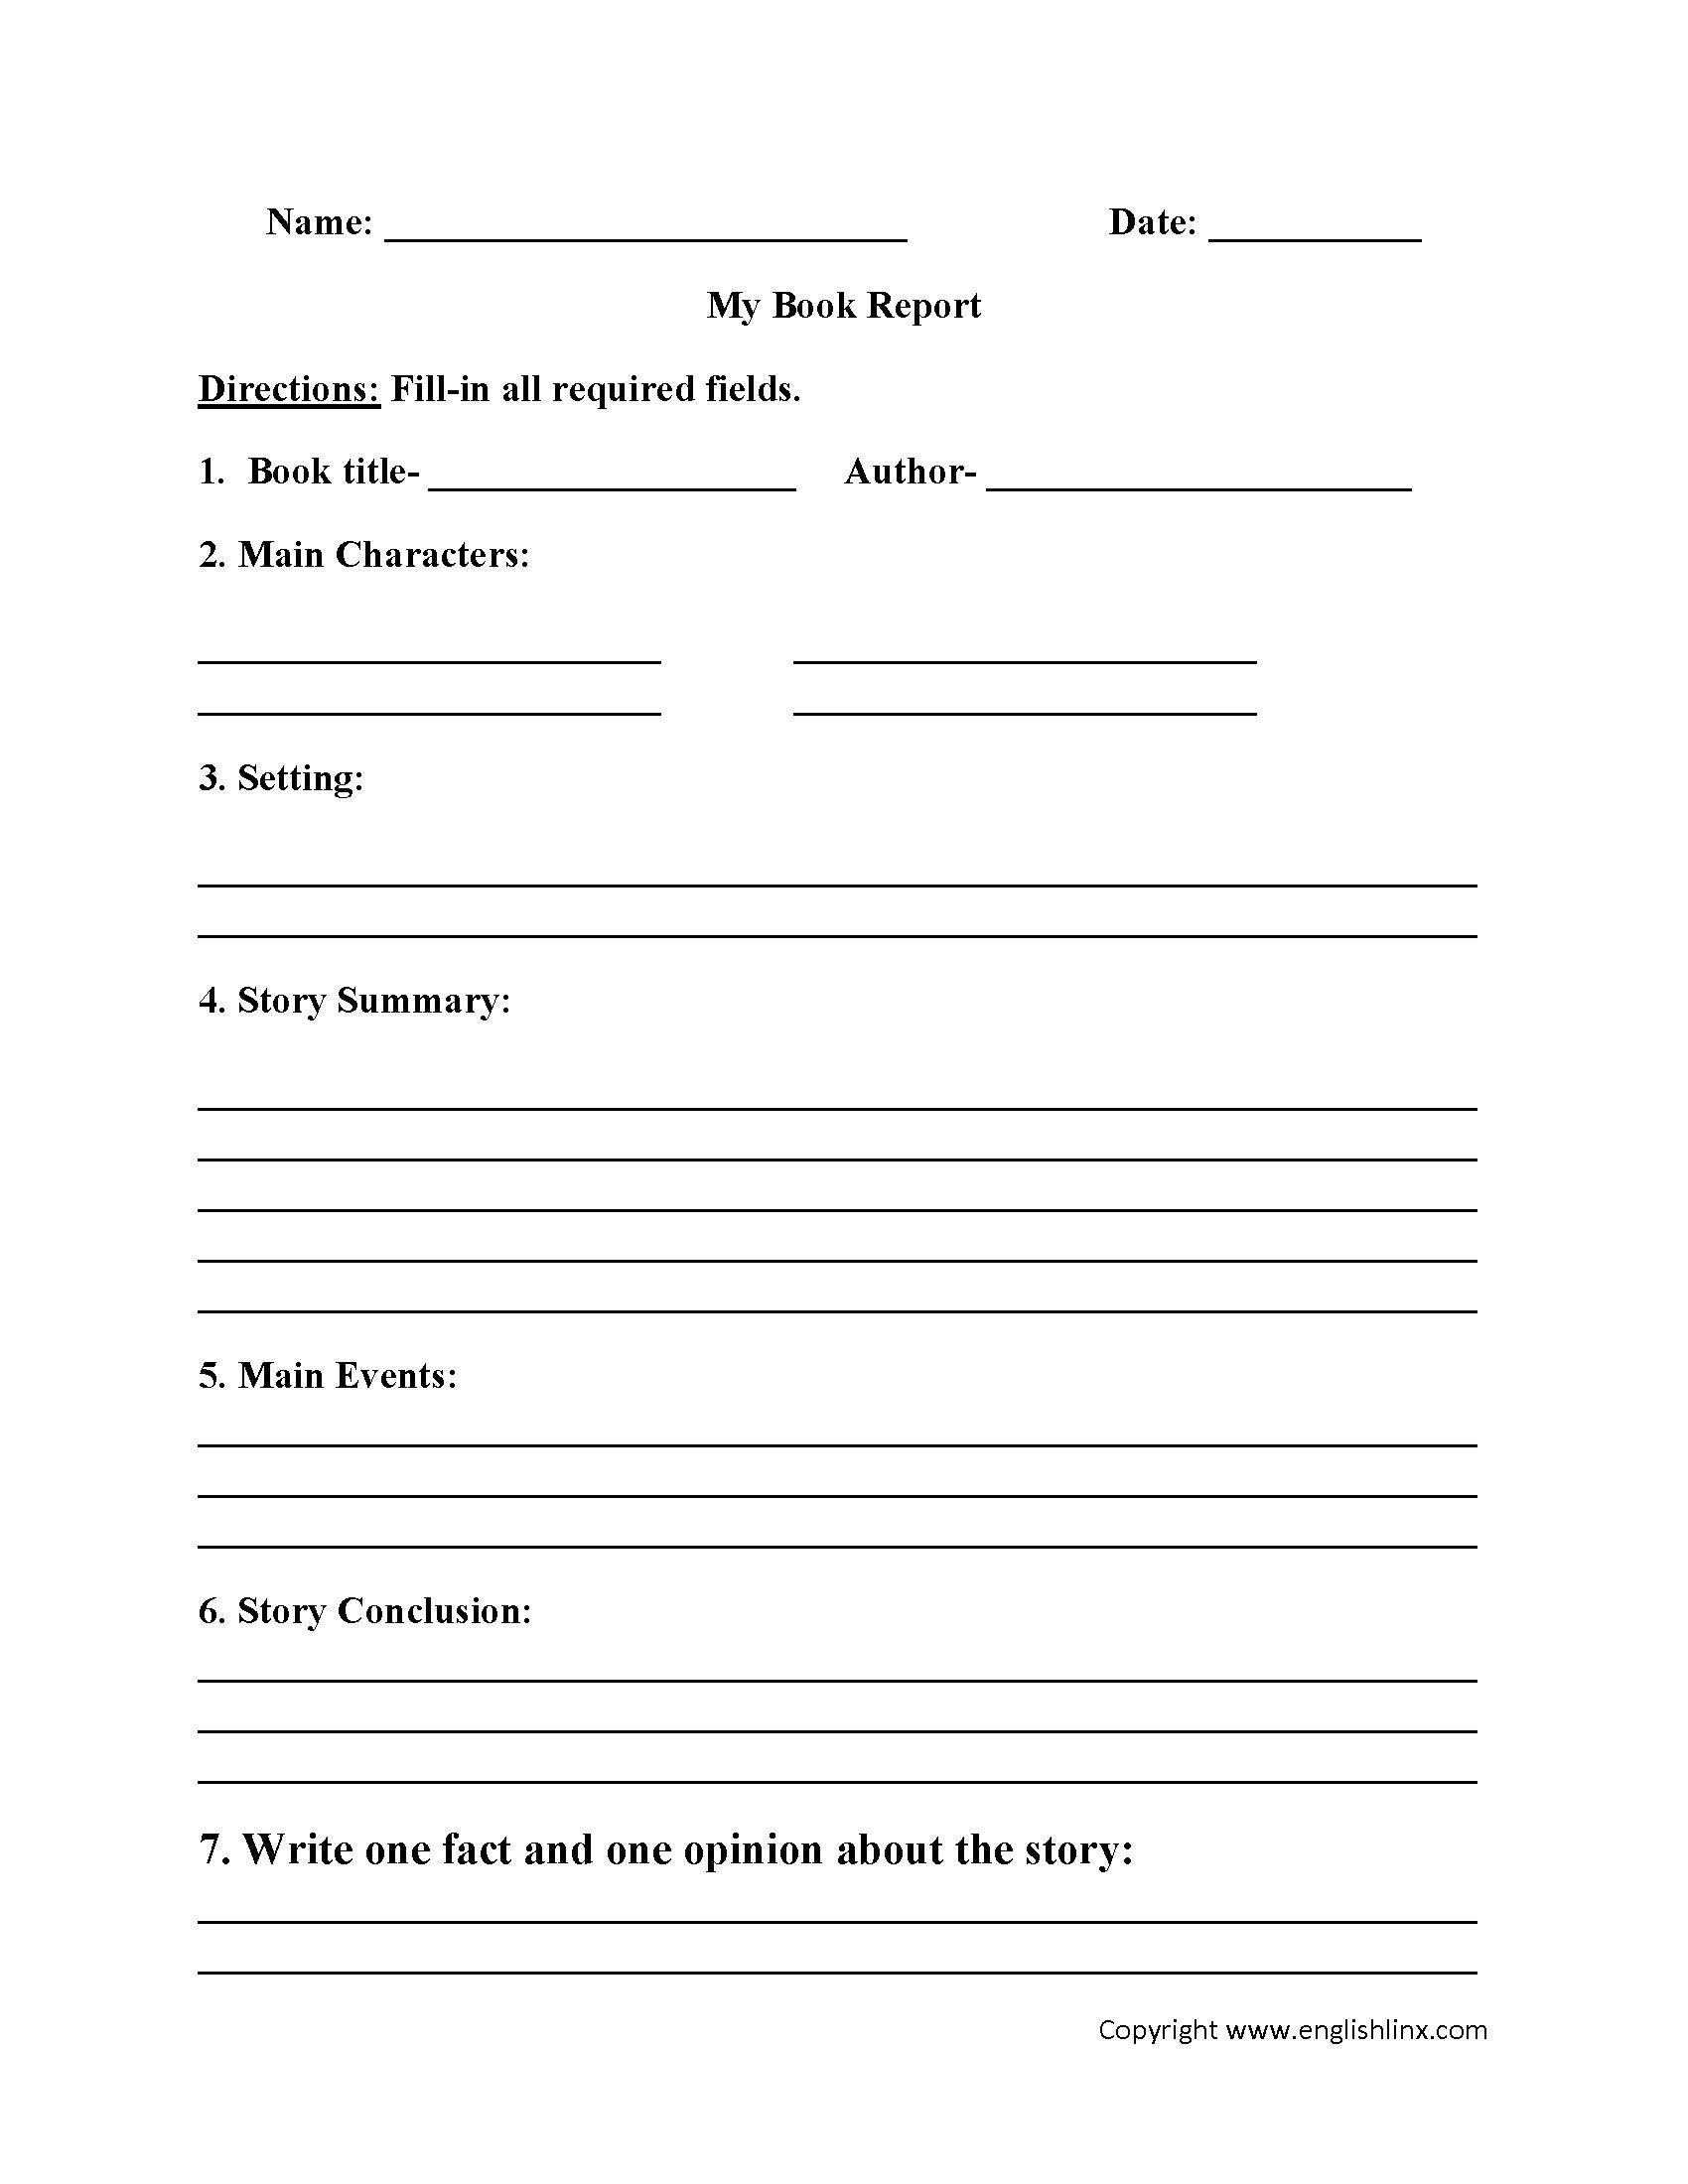 Englishlinx | Book Report Worksheets | Printable Book Report Worksheets